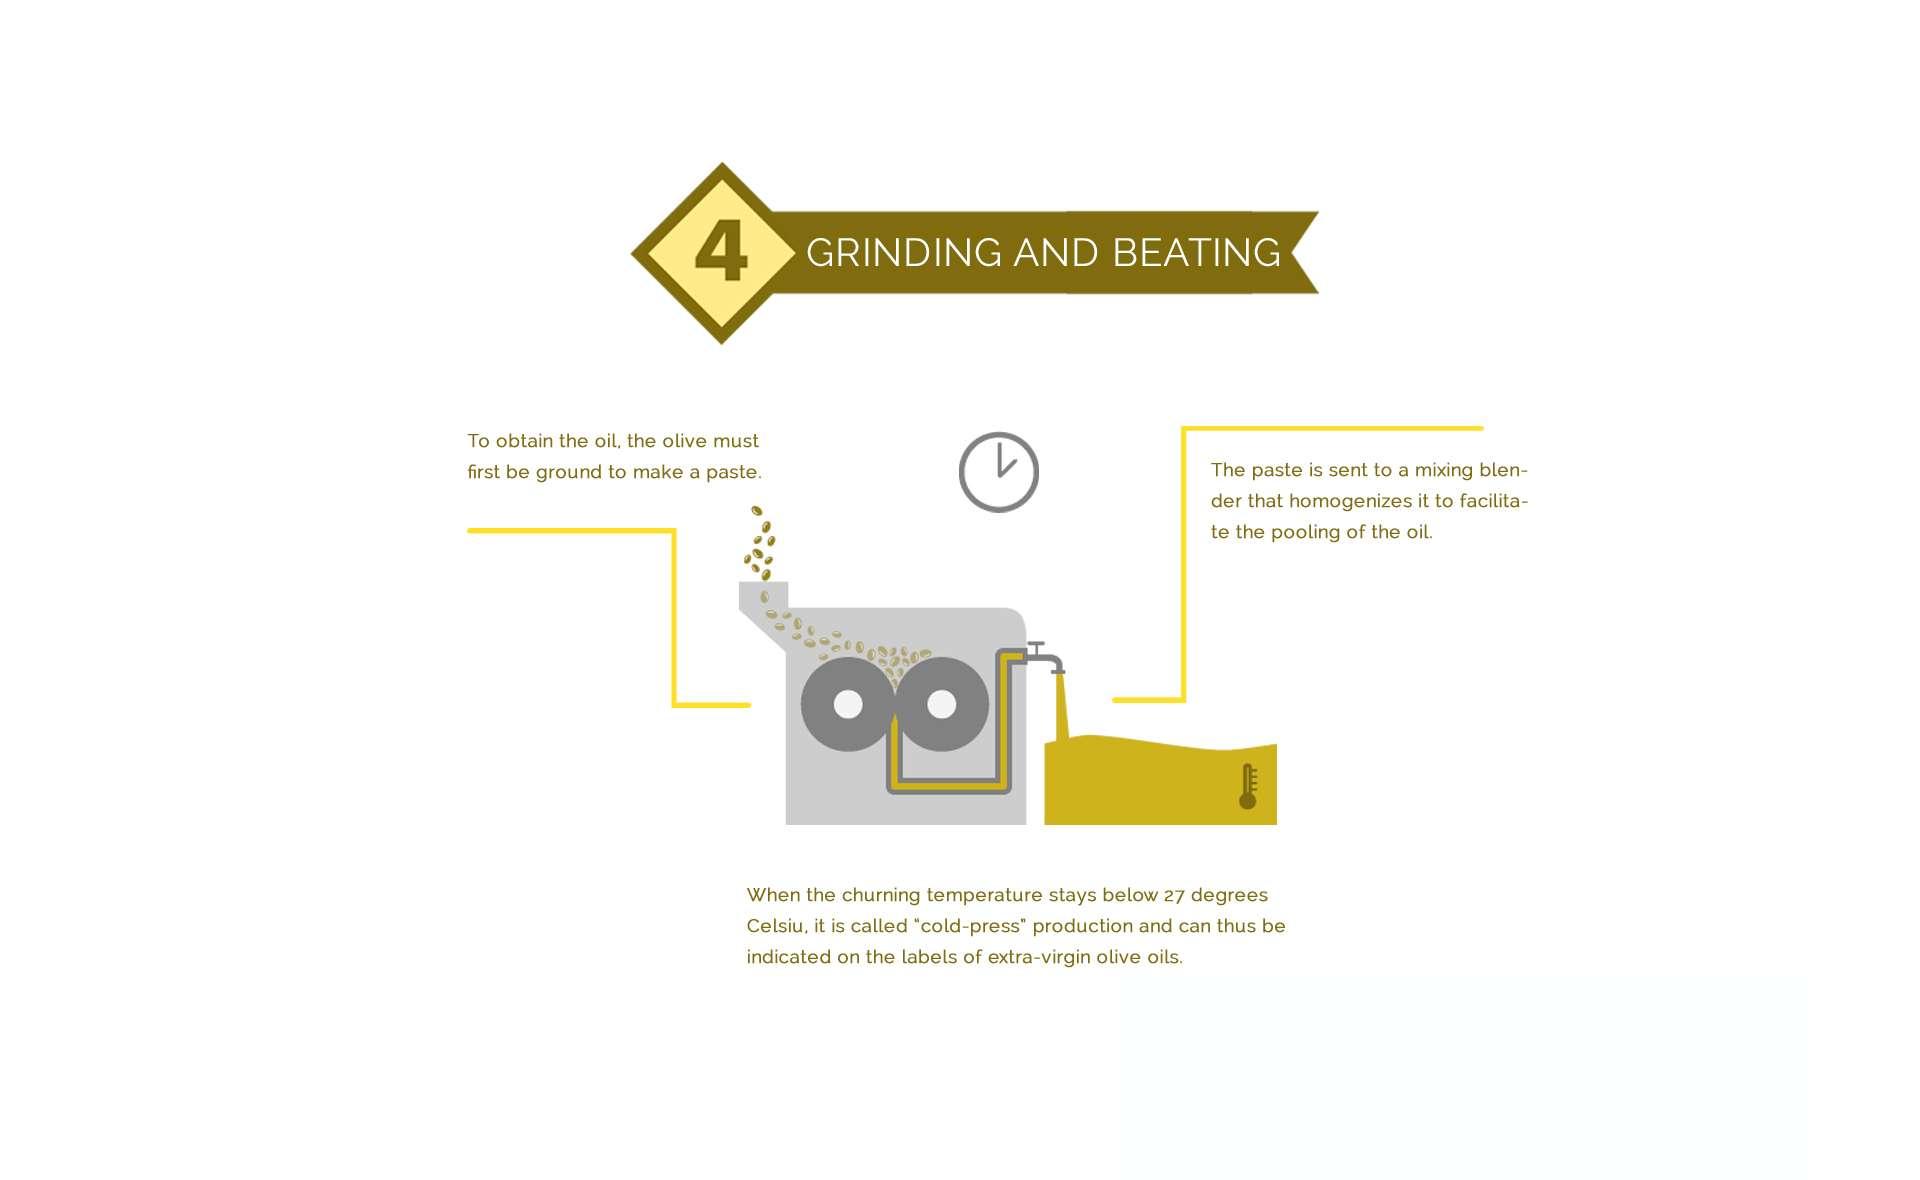 Olive oil grinding